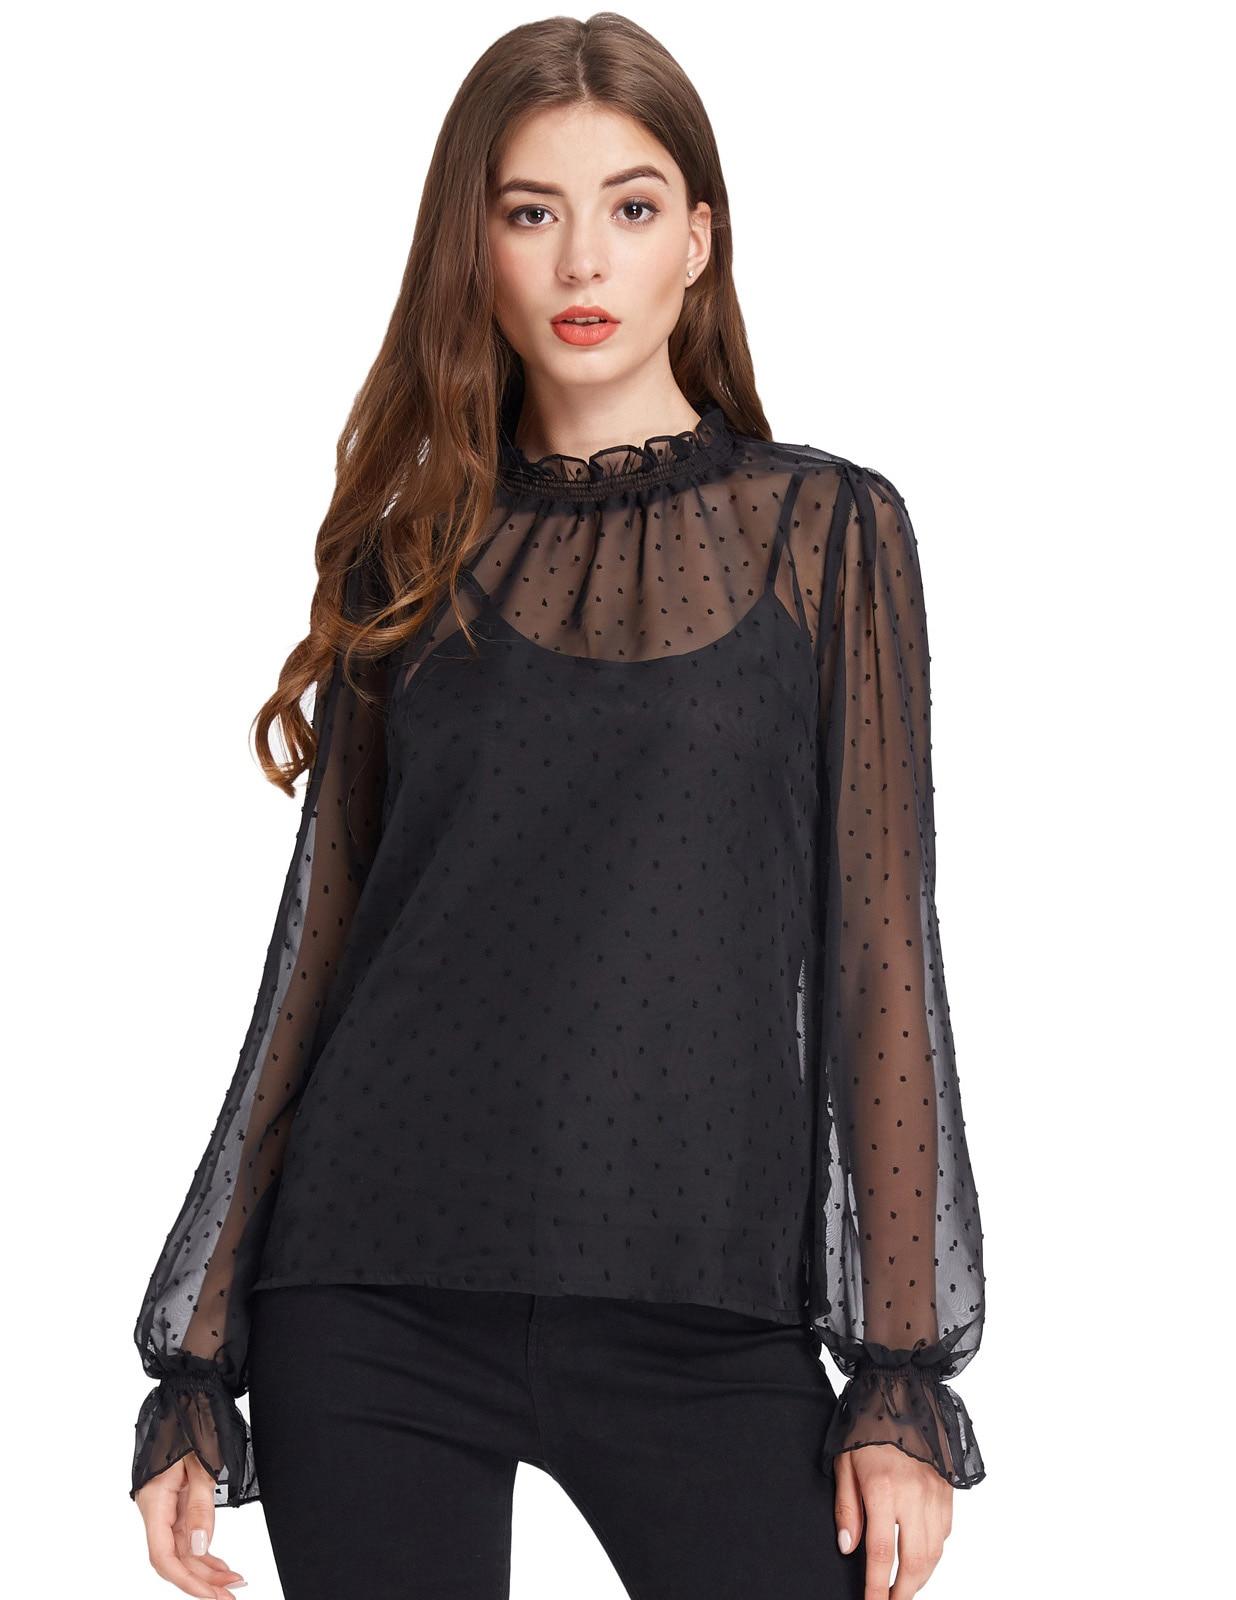 summer shirts 2018 Sexy see through polka dot shirt Women Summer Long falre Sleeve High Neck Chiffon shirts Tops+Cami 2pcs Set